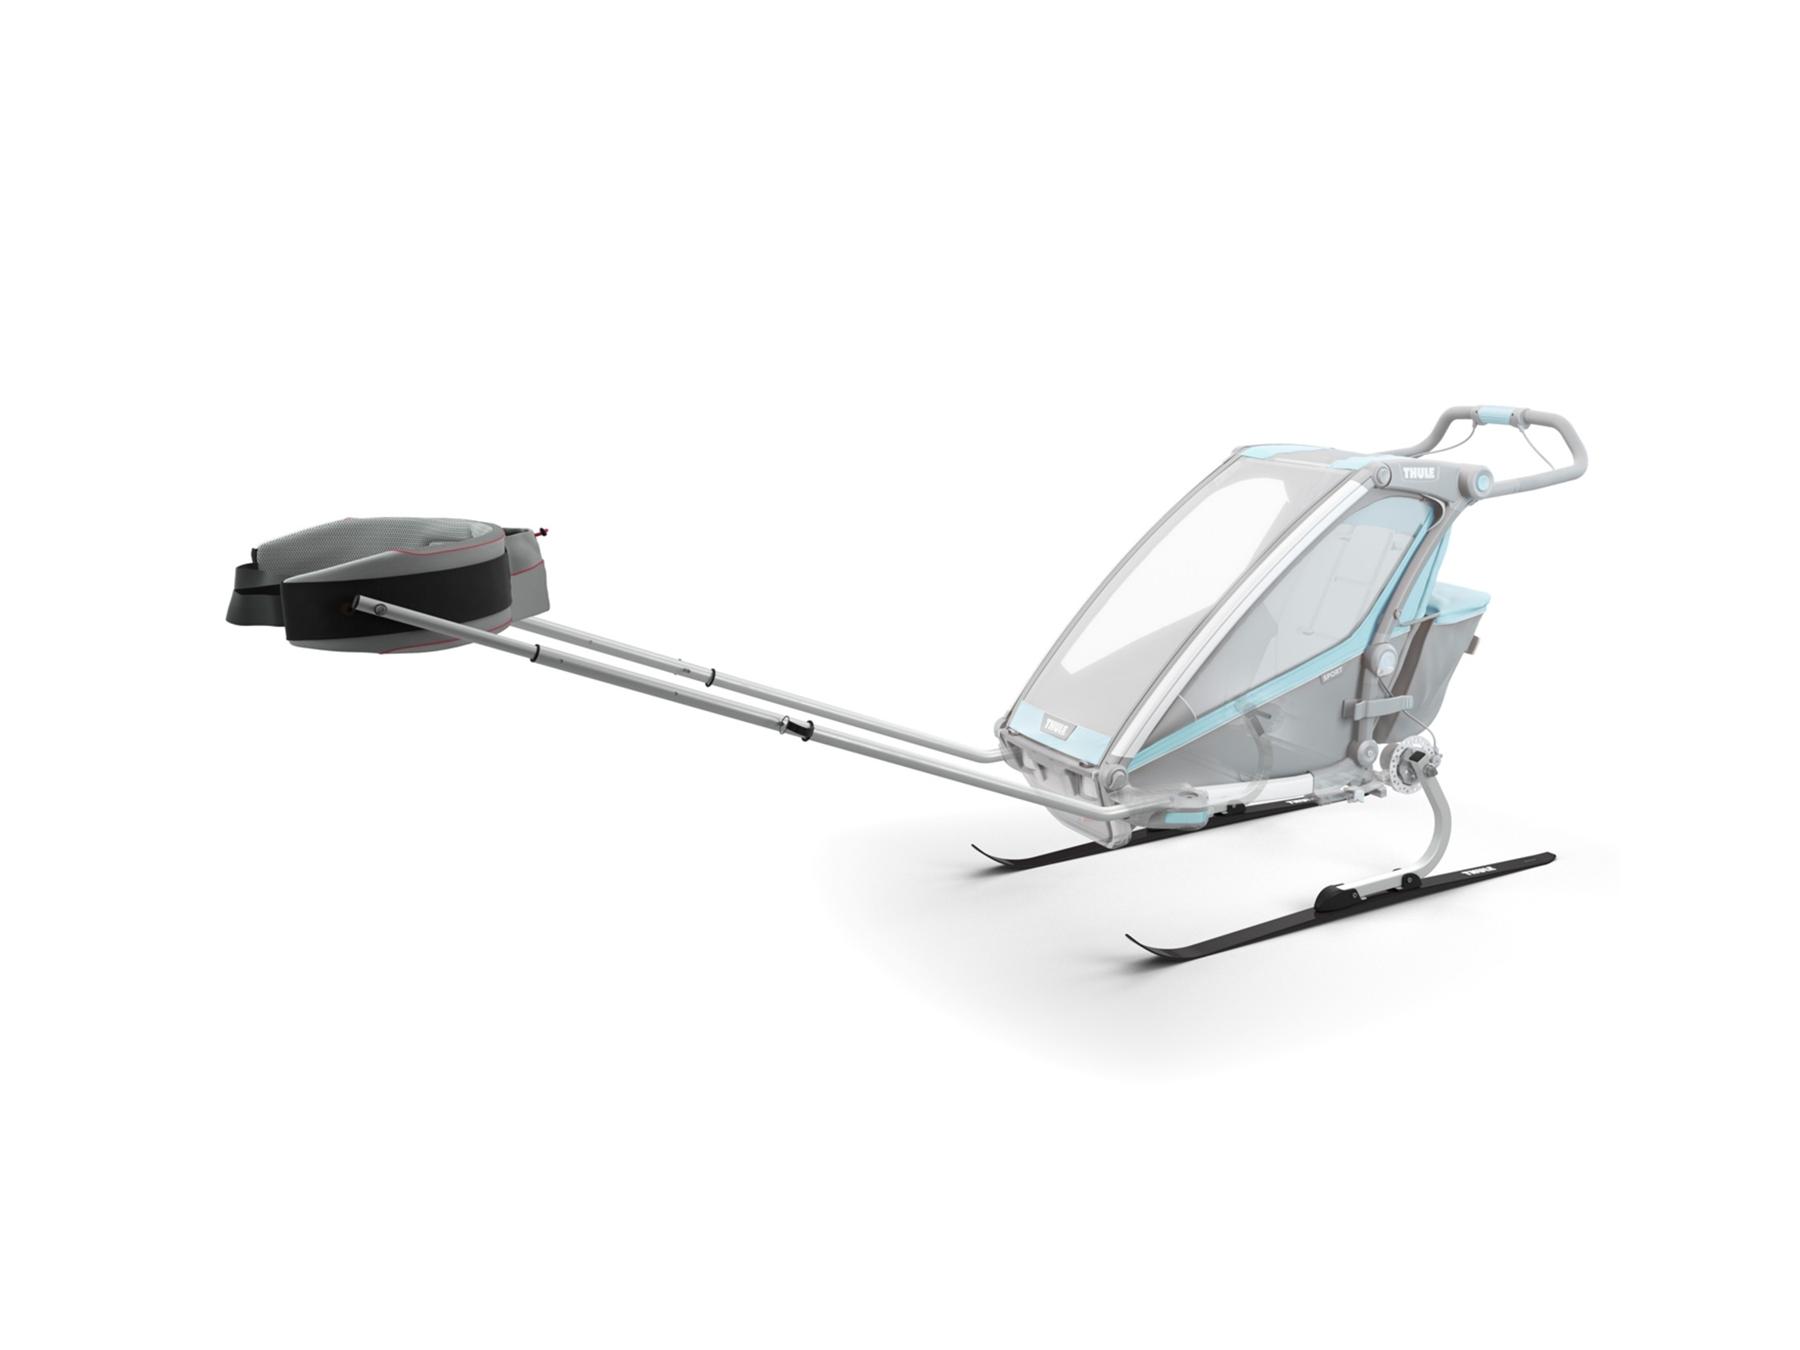 Thule Chariot Ski Kit